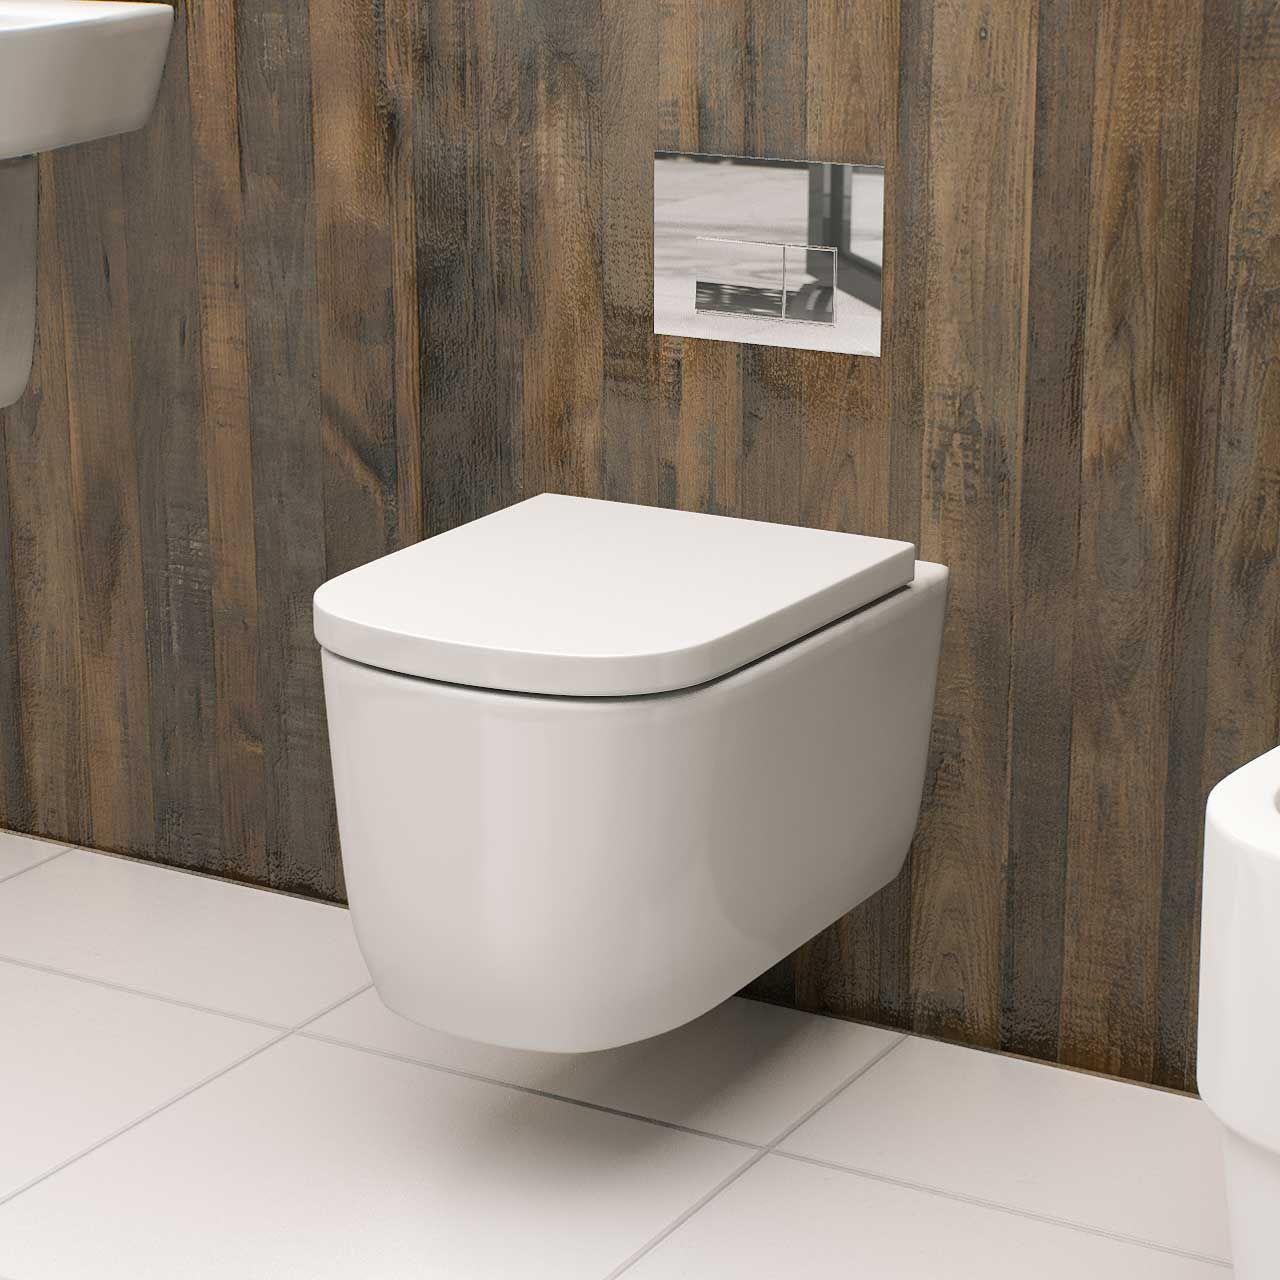 Galata Wall Hung Toilet With Slow Close